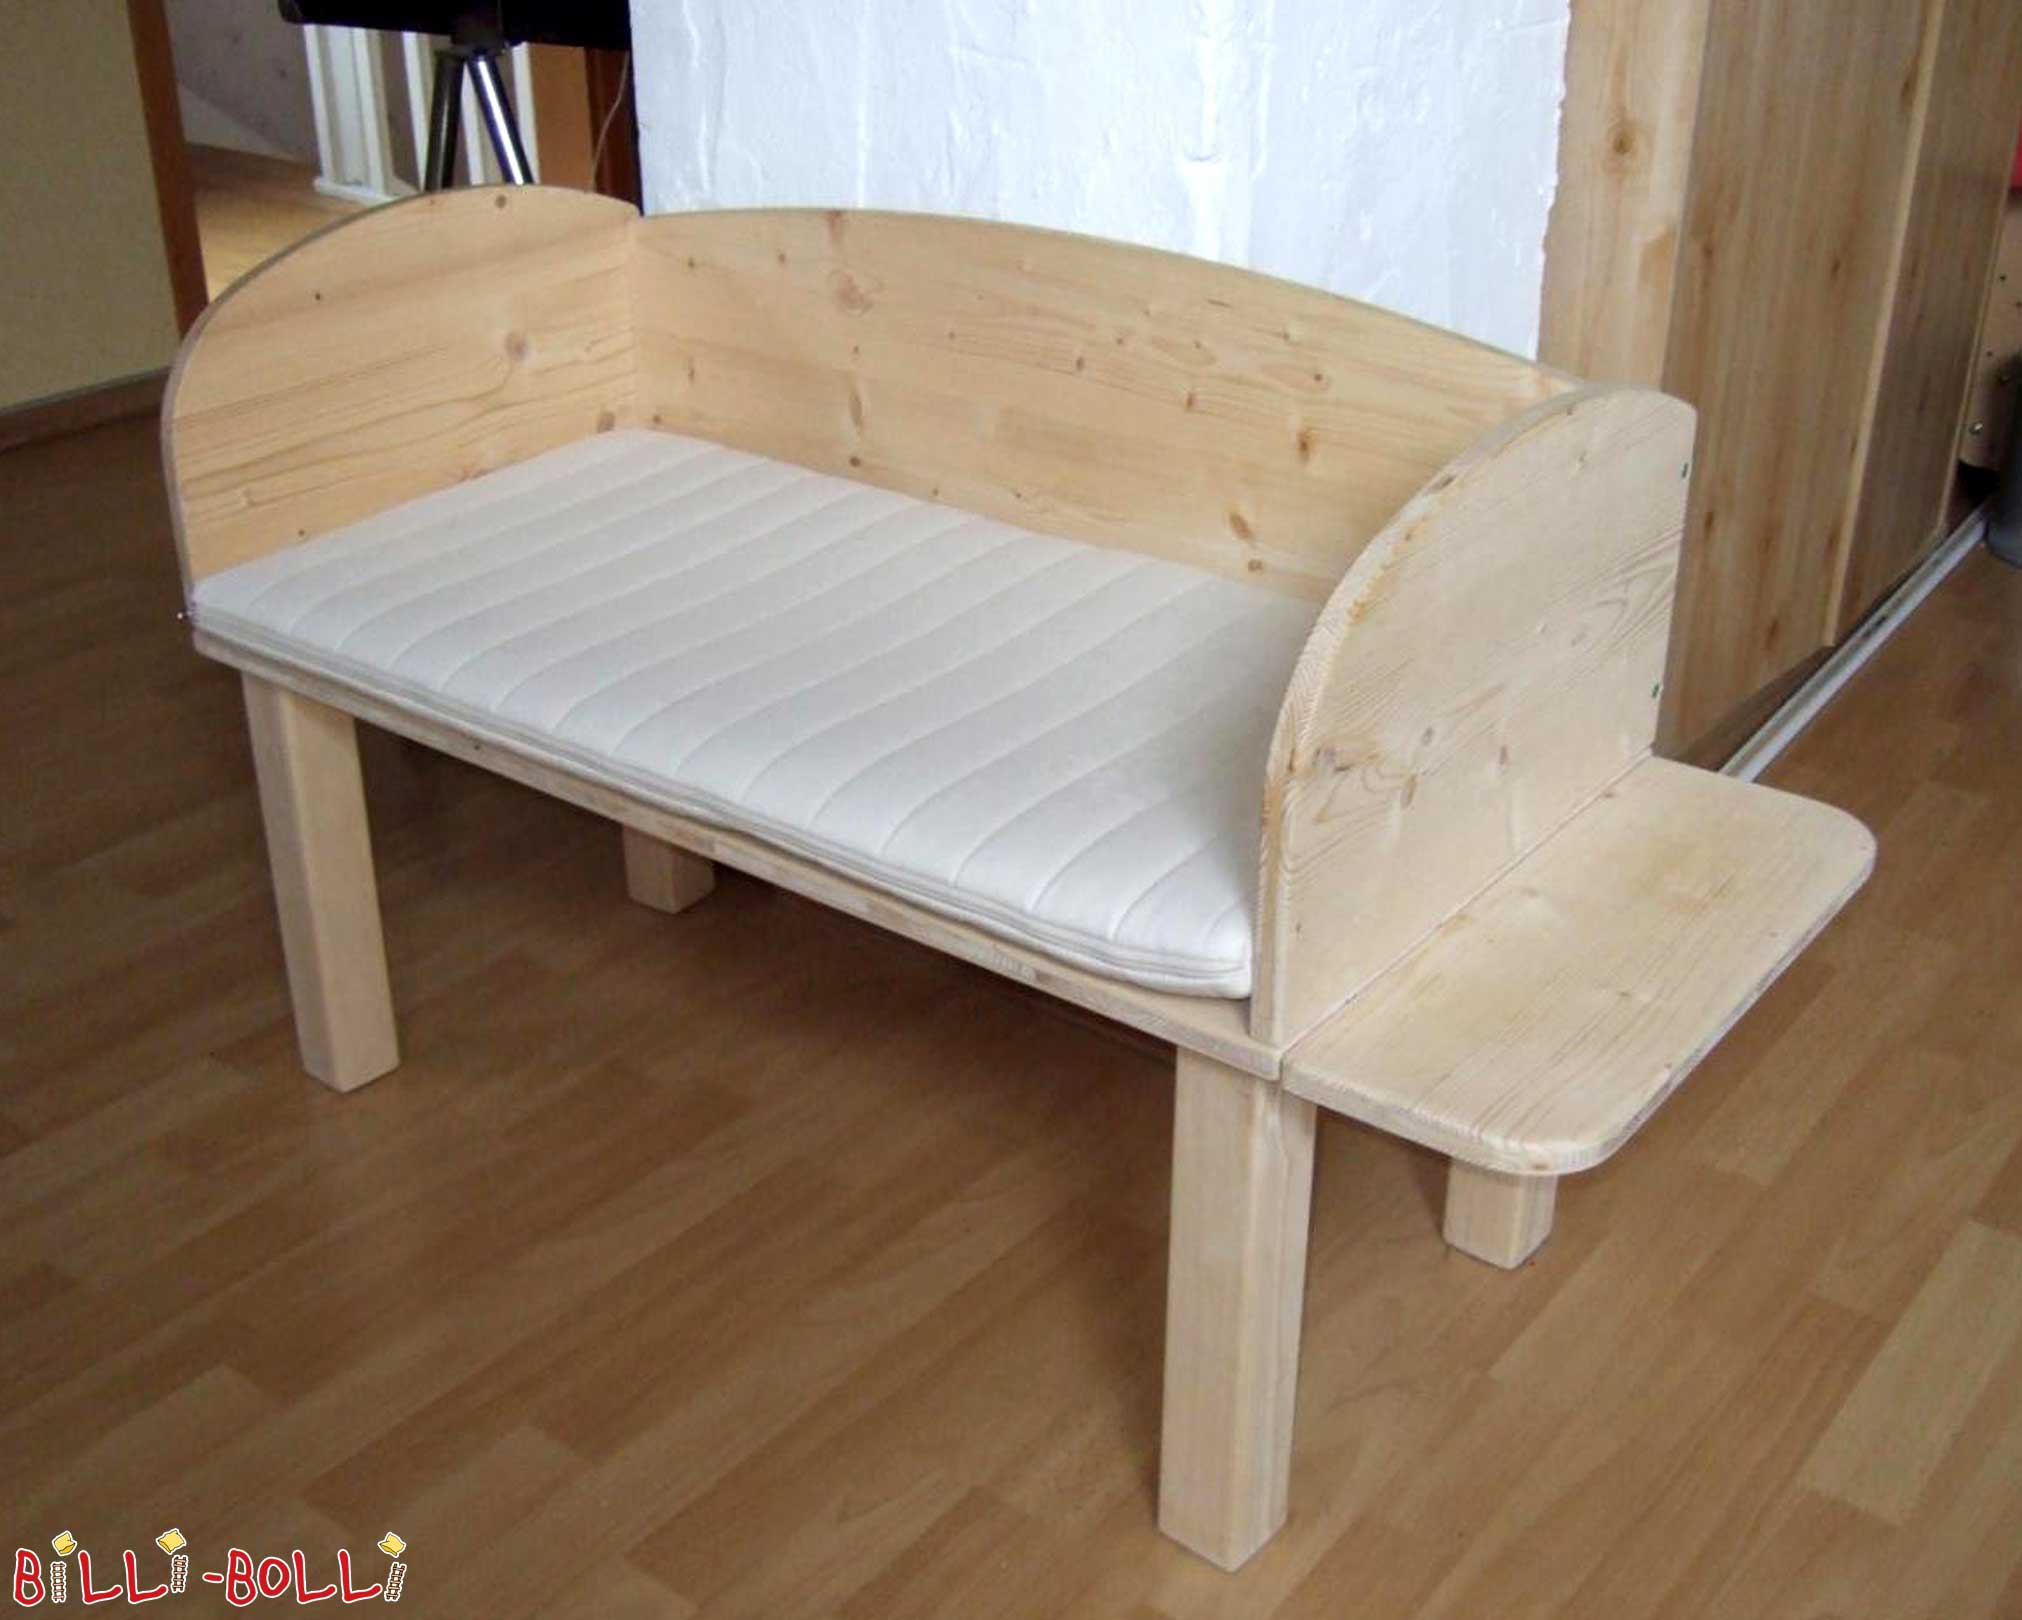 Bedside Crib Billi Bolli Kids Furniture